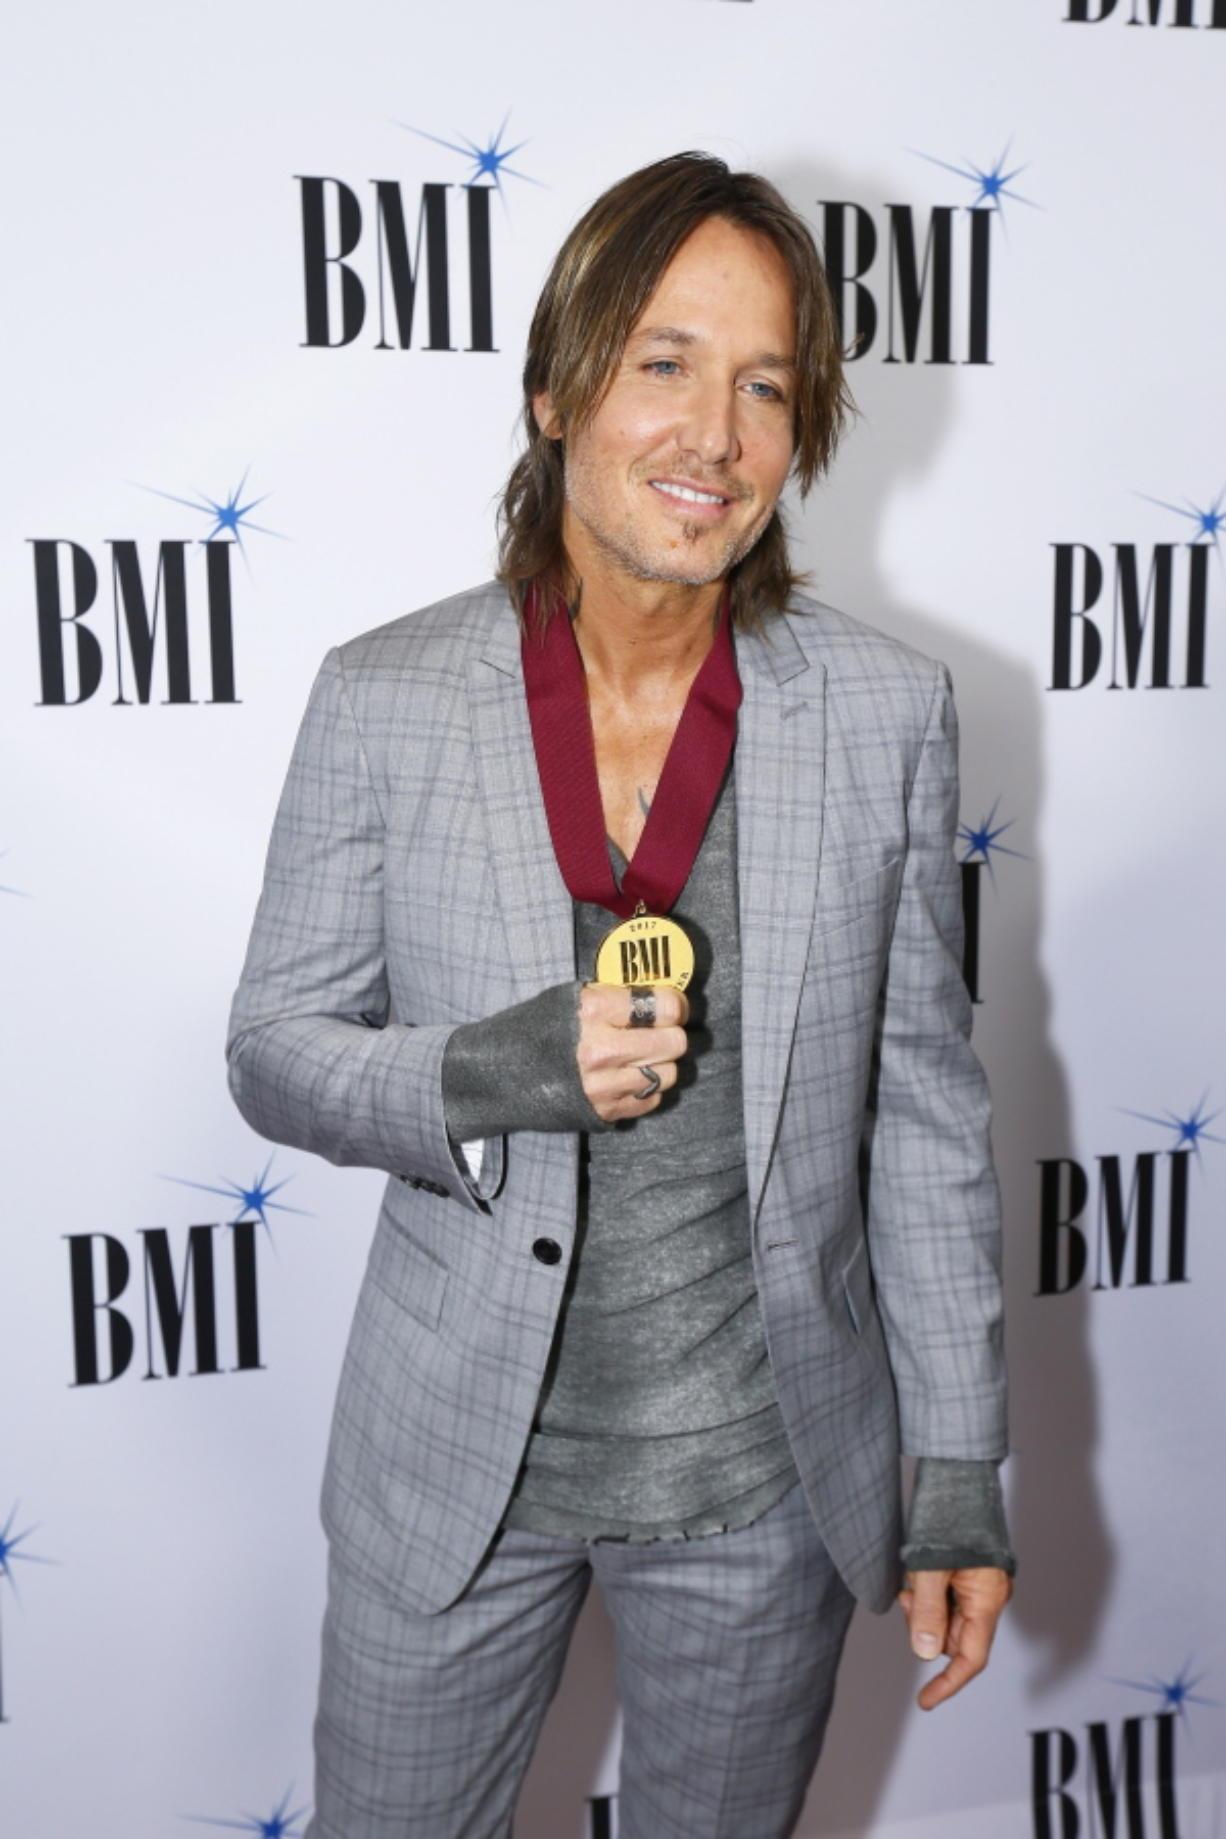 Keith Urban arrives at the BMI Awards at BMI Nashville on Nov. 7 in Nashville, Tenn.